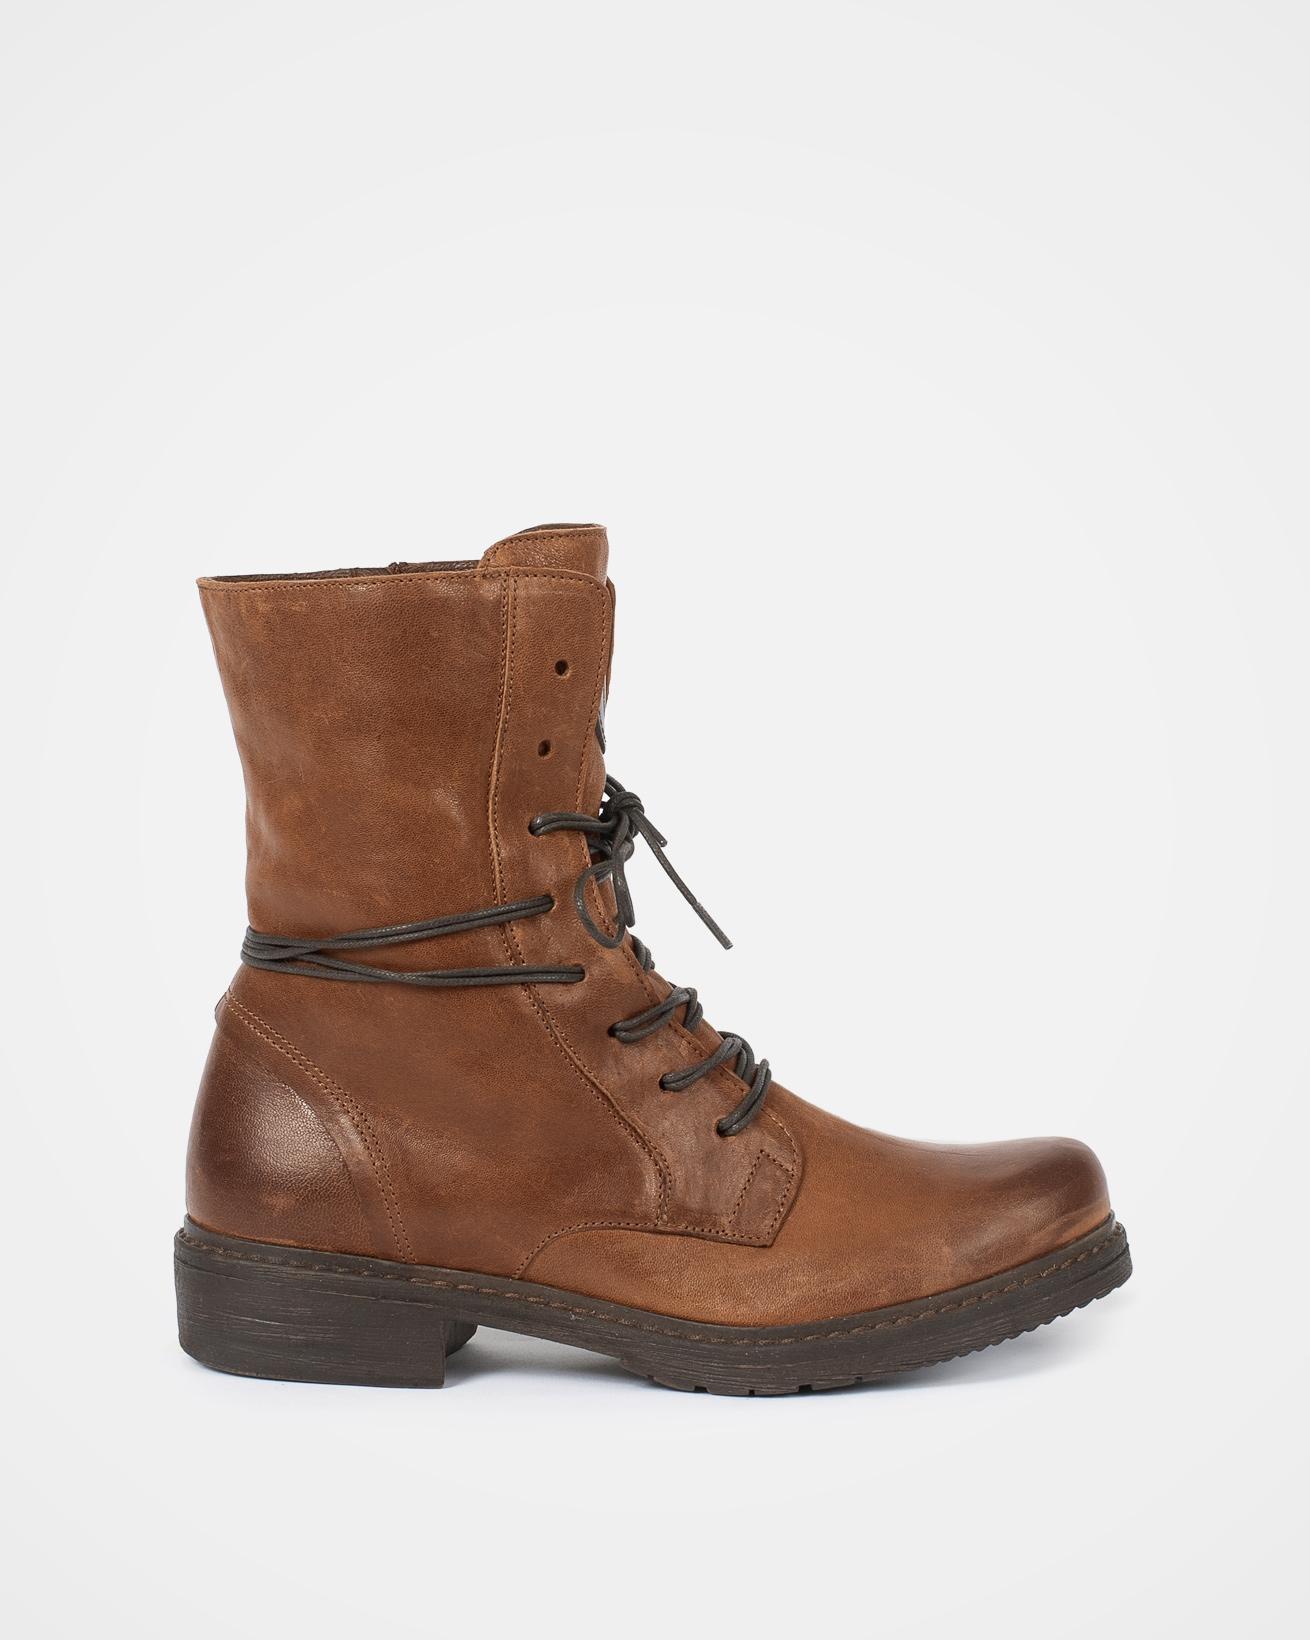 7725-ladies-derby-boot-antique-brown-outside-web-lfs-rev.jpg